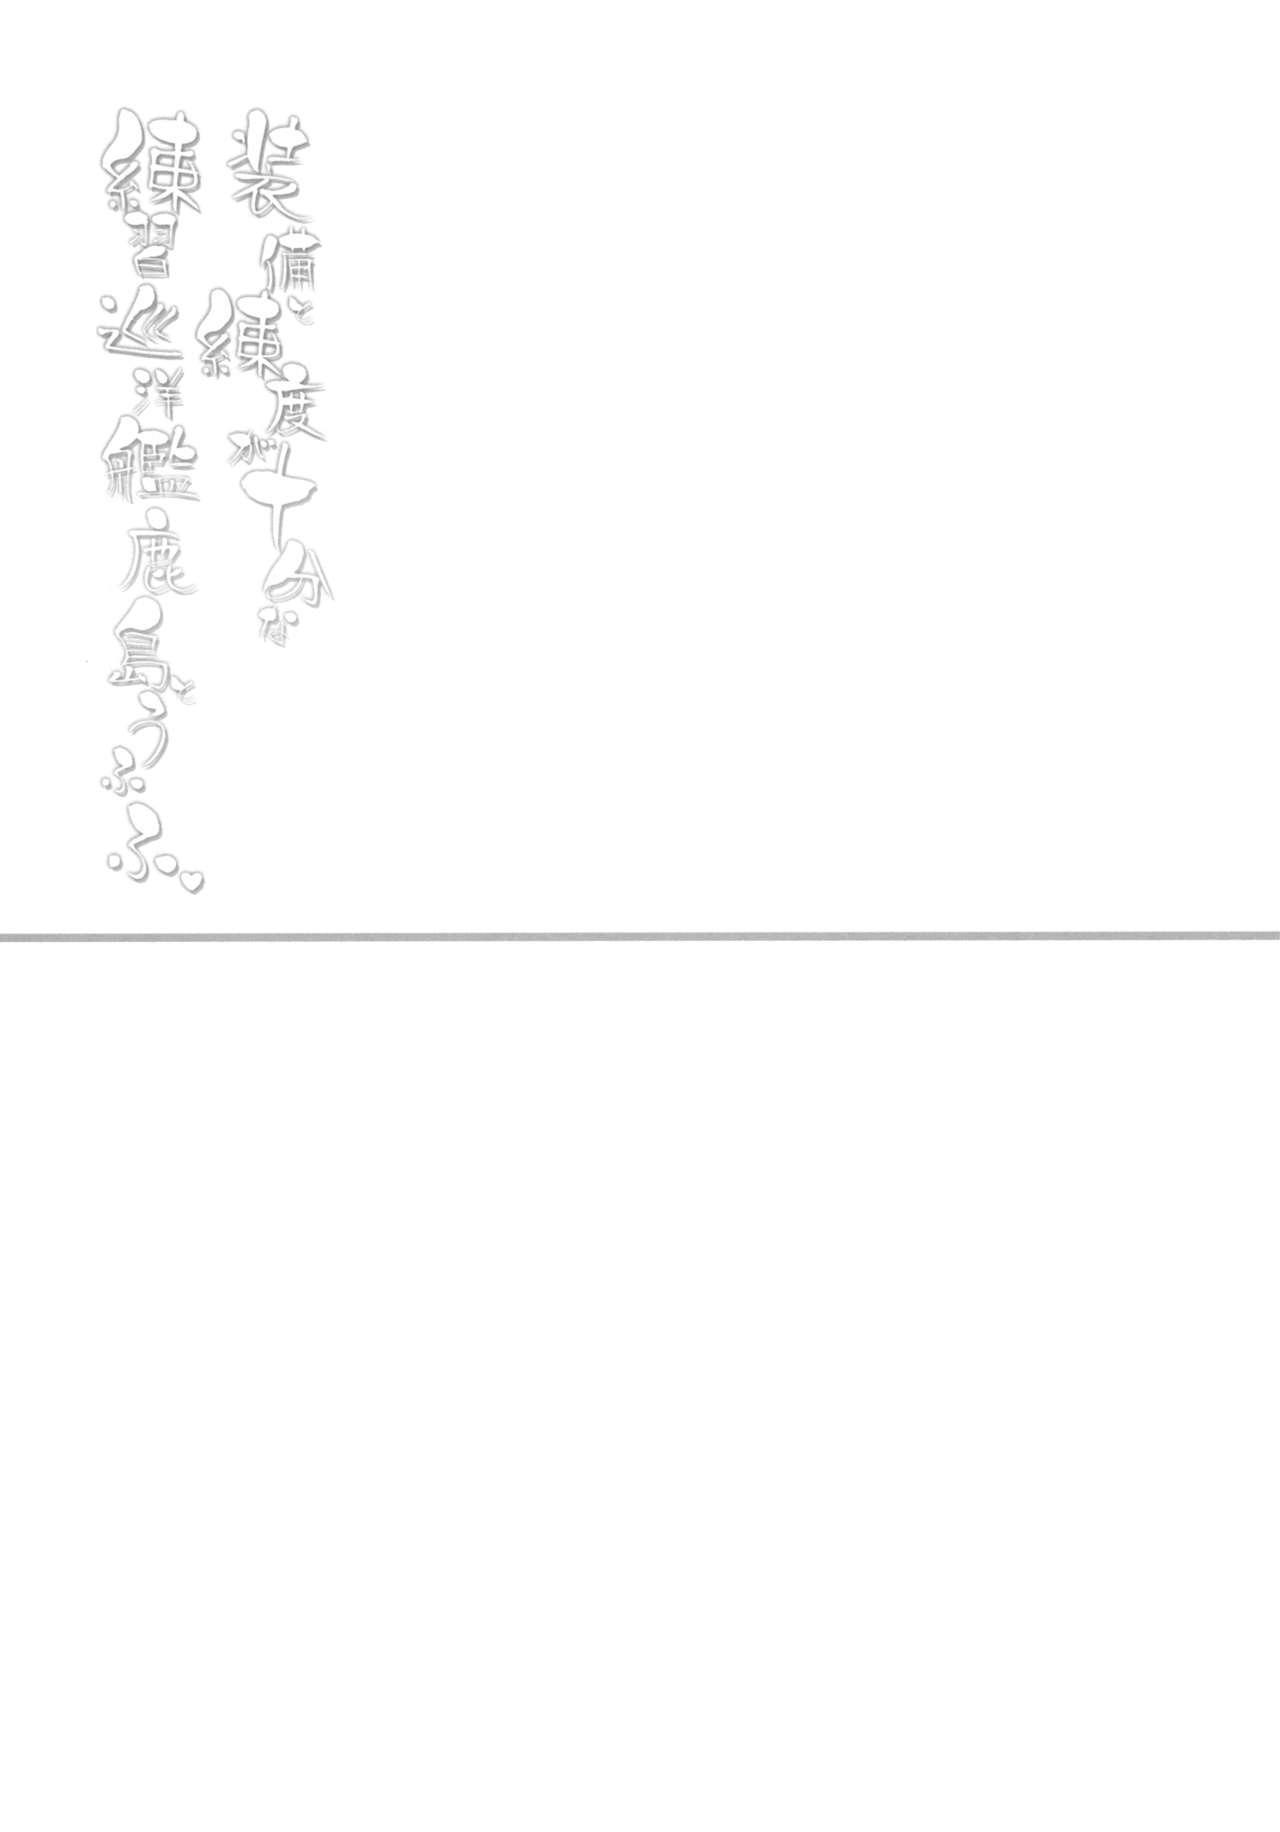 Soubi to Rendo ga Juubun na Renshuu Junyoukan Kashima to Ufufu 19